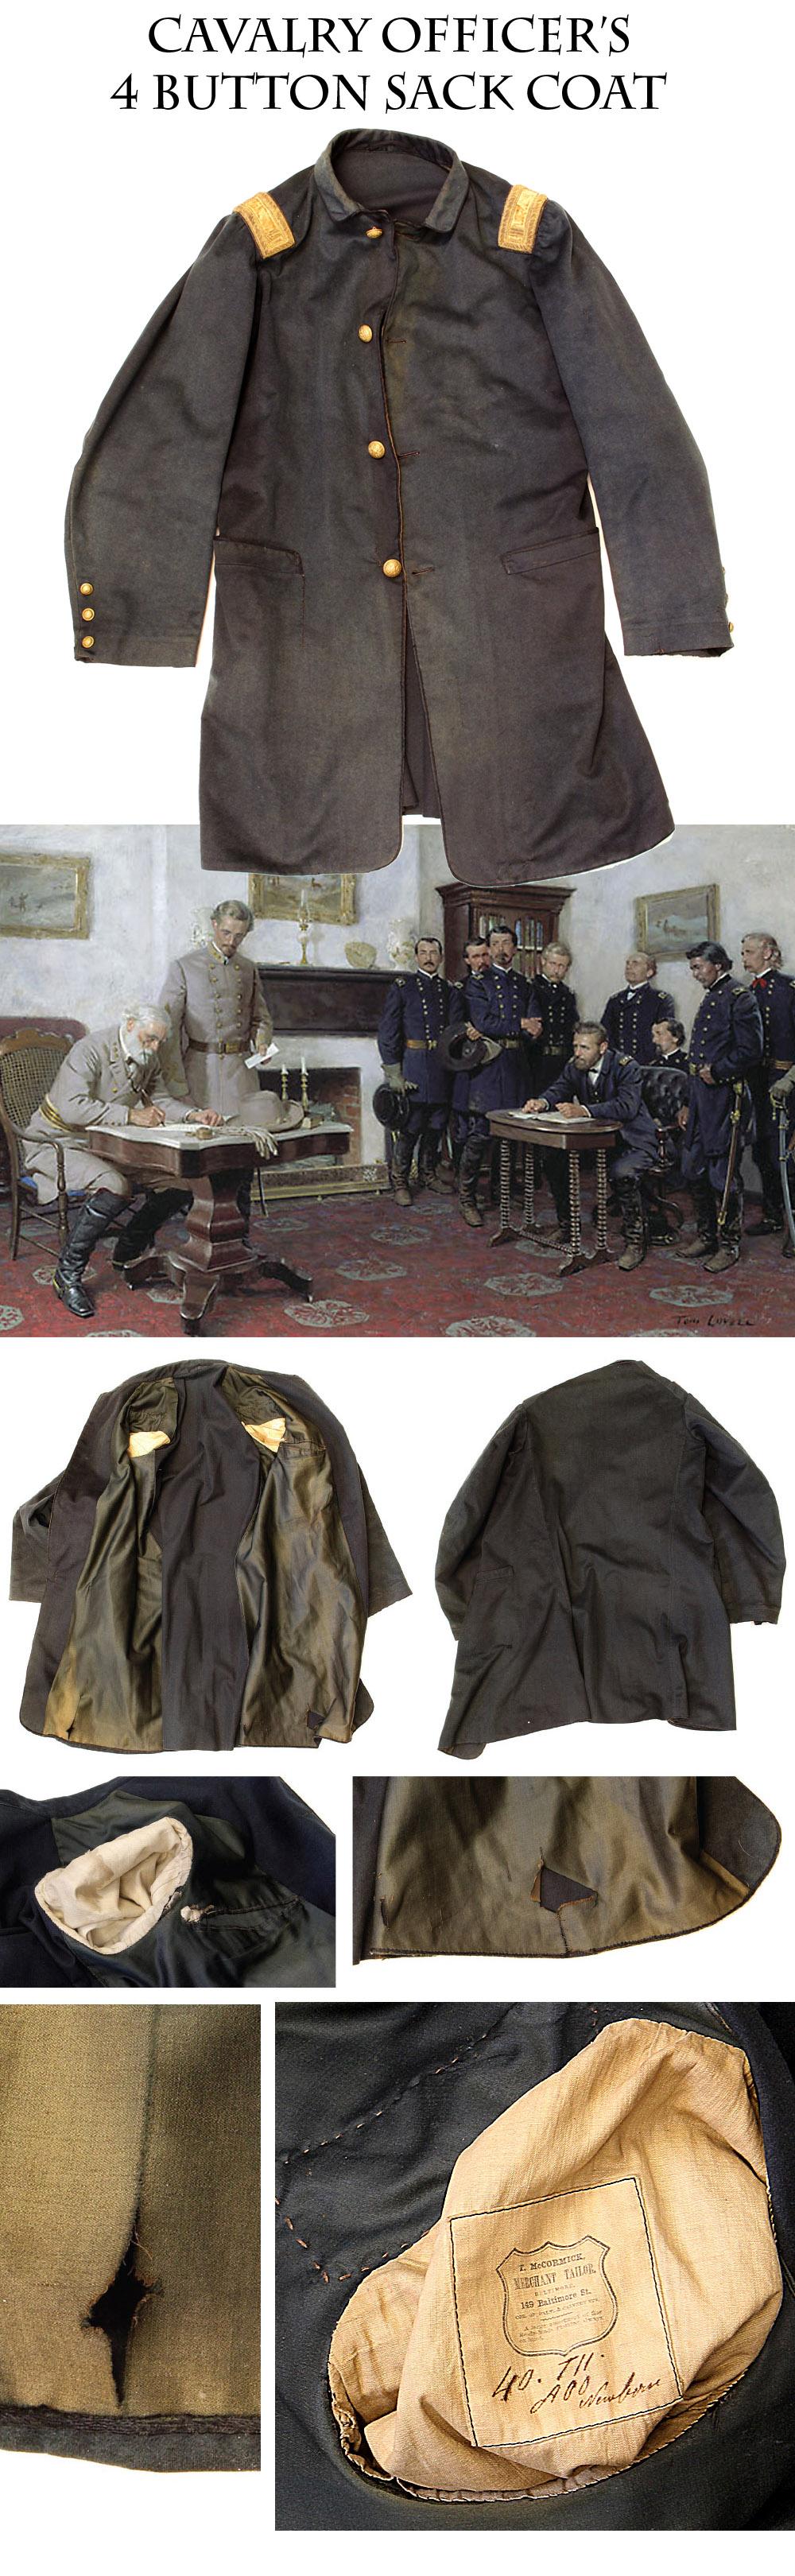 Civil War Union Cavalry Captain's 4-button Sack Coat with a Baltimore Maker's Label